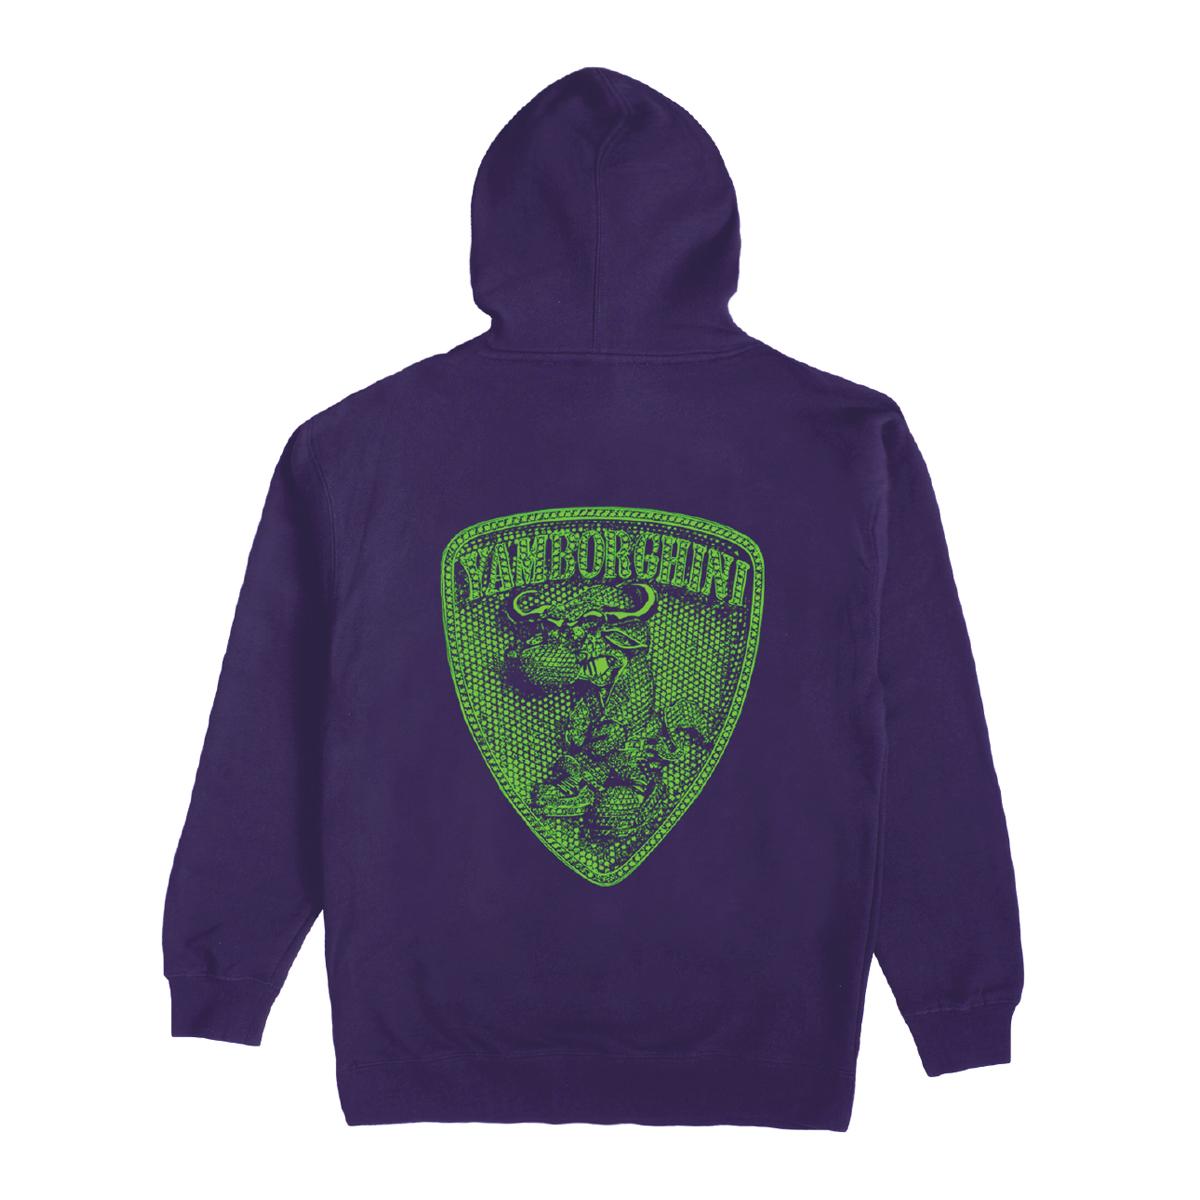 A$AP Ferg Yamborghini High Pullover Hoodie